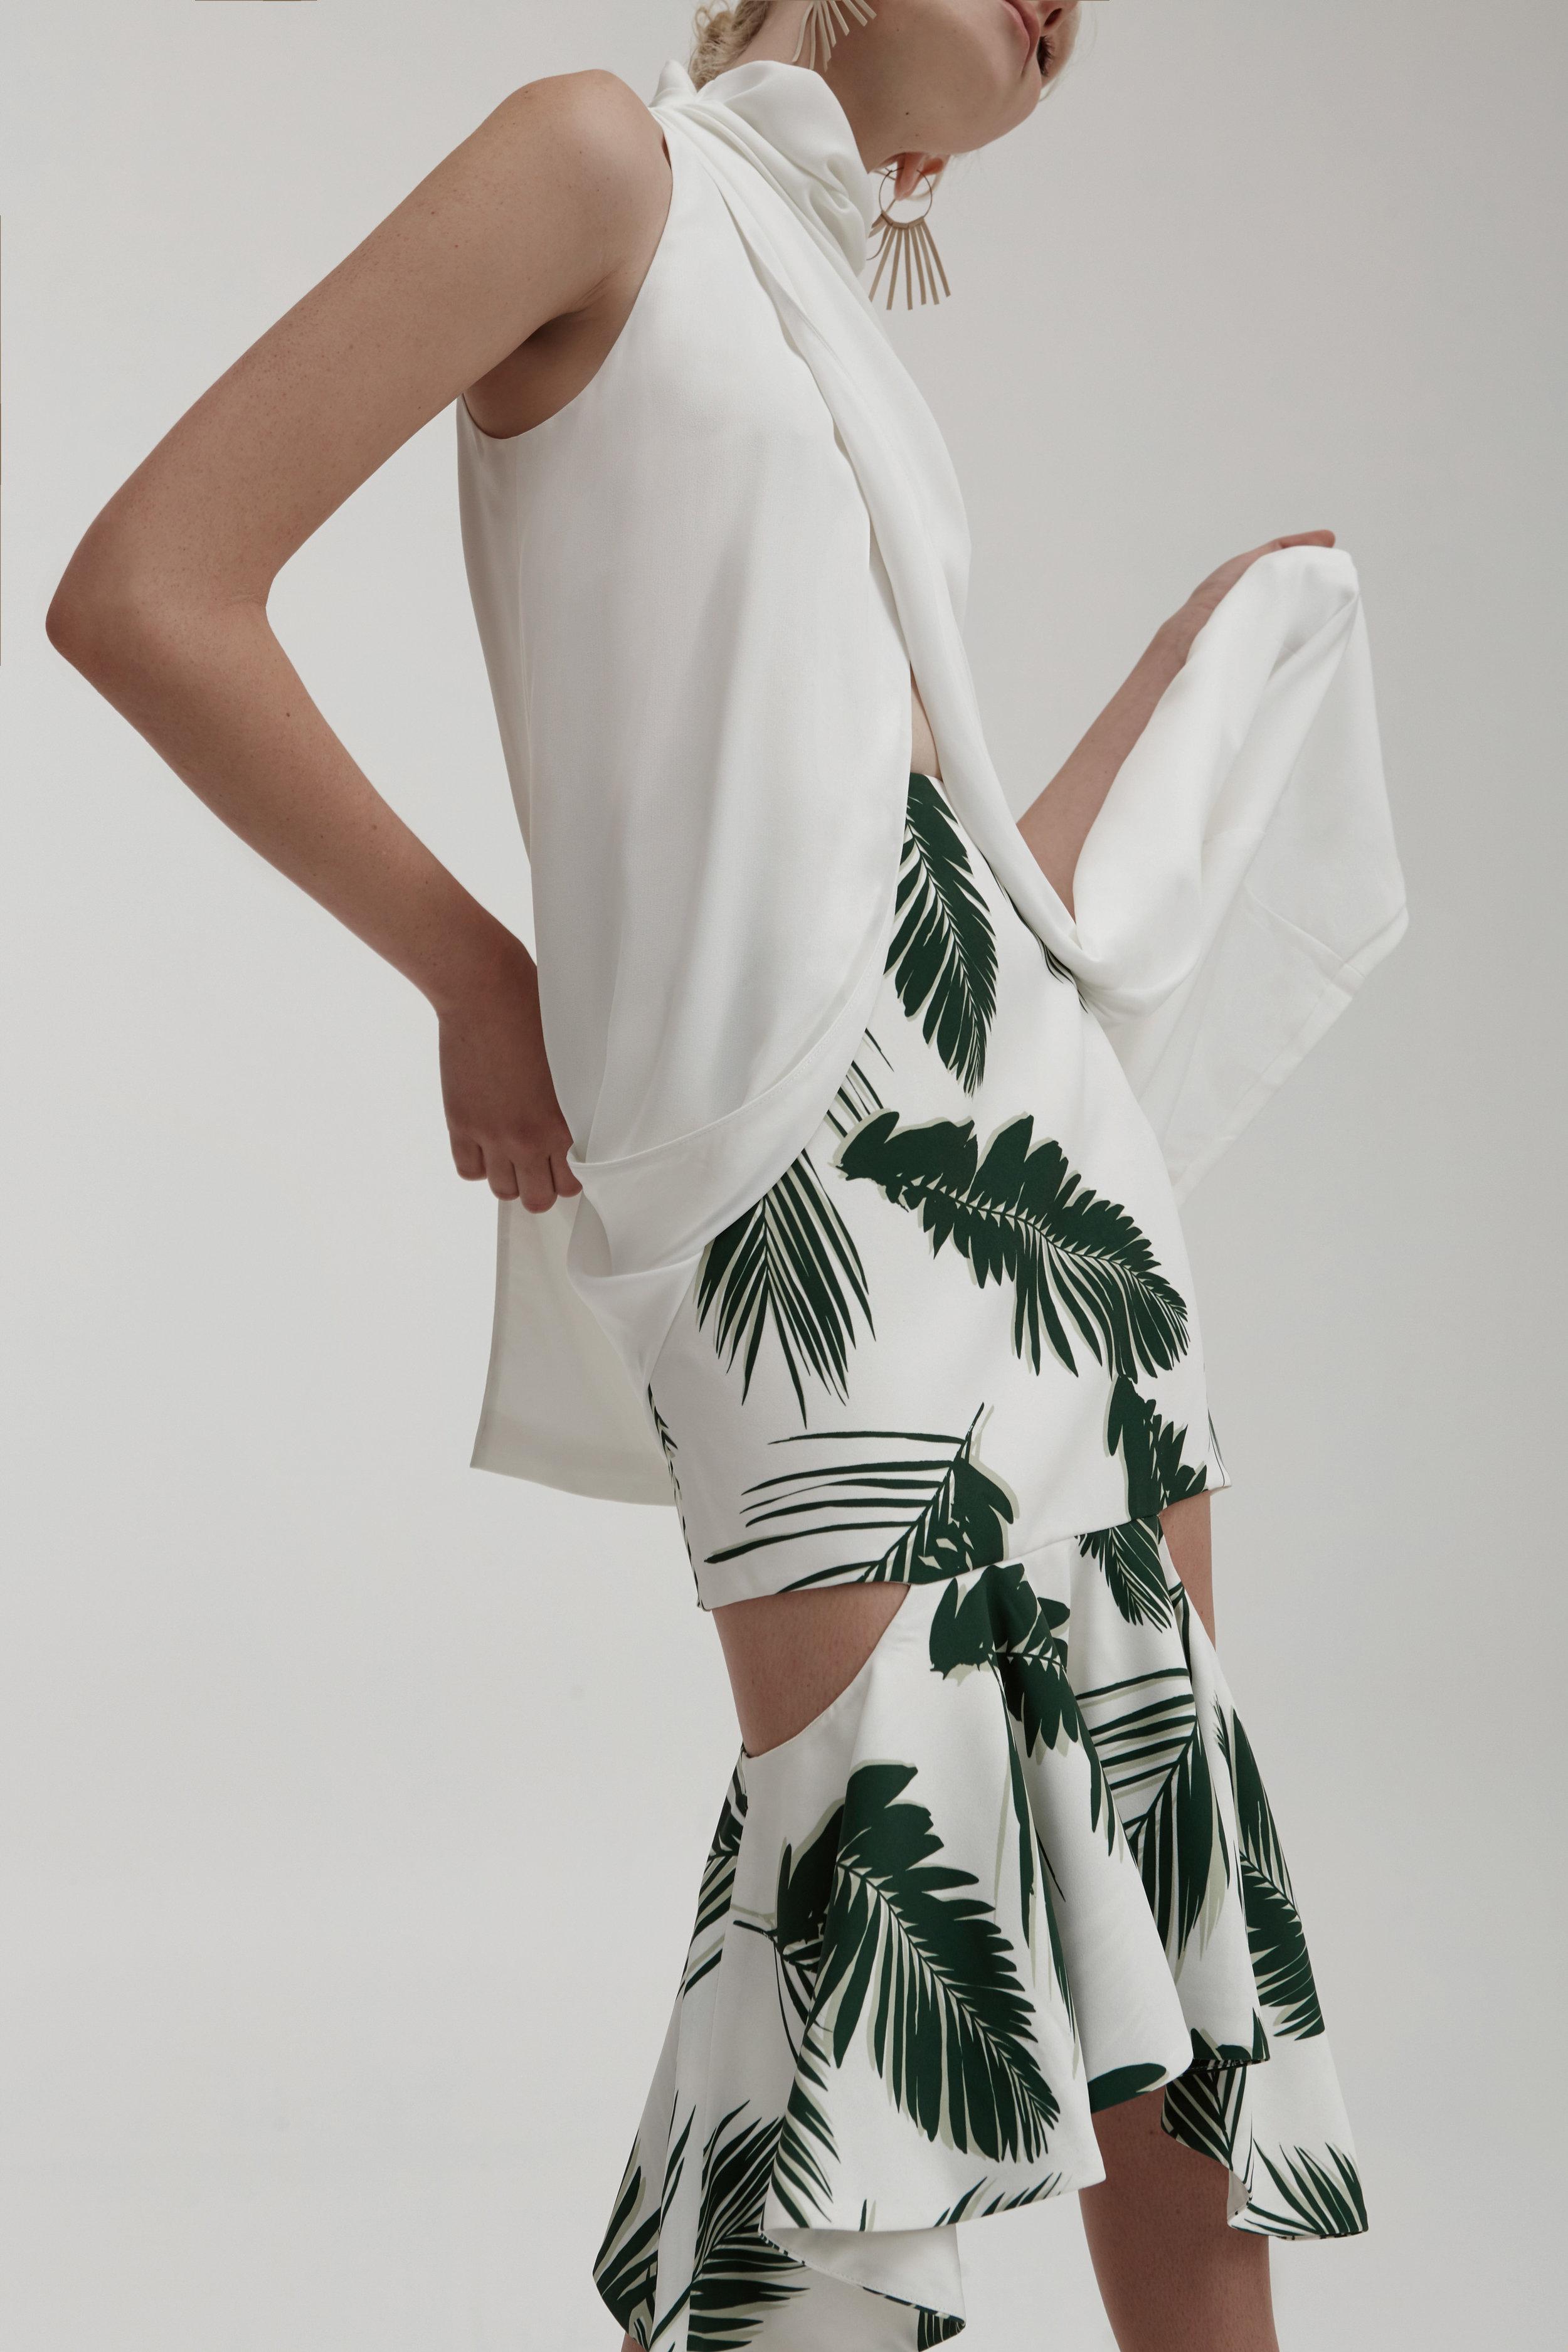 C/MEO COLLECTIVE Never Be Like You Dress + Enfold Skirt.